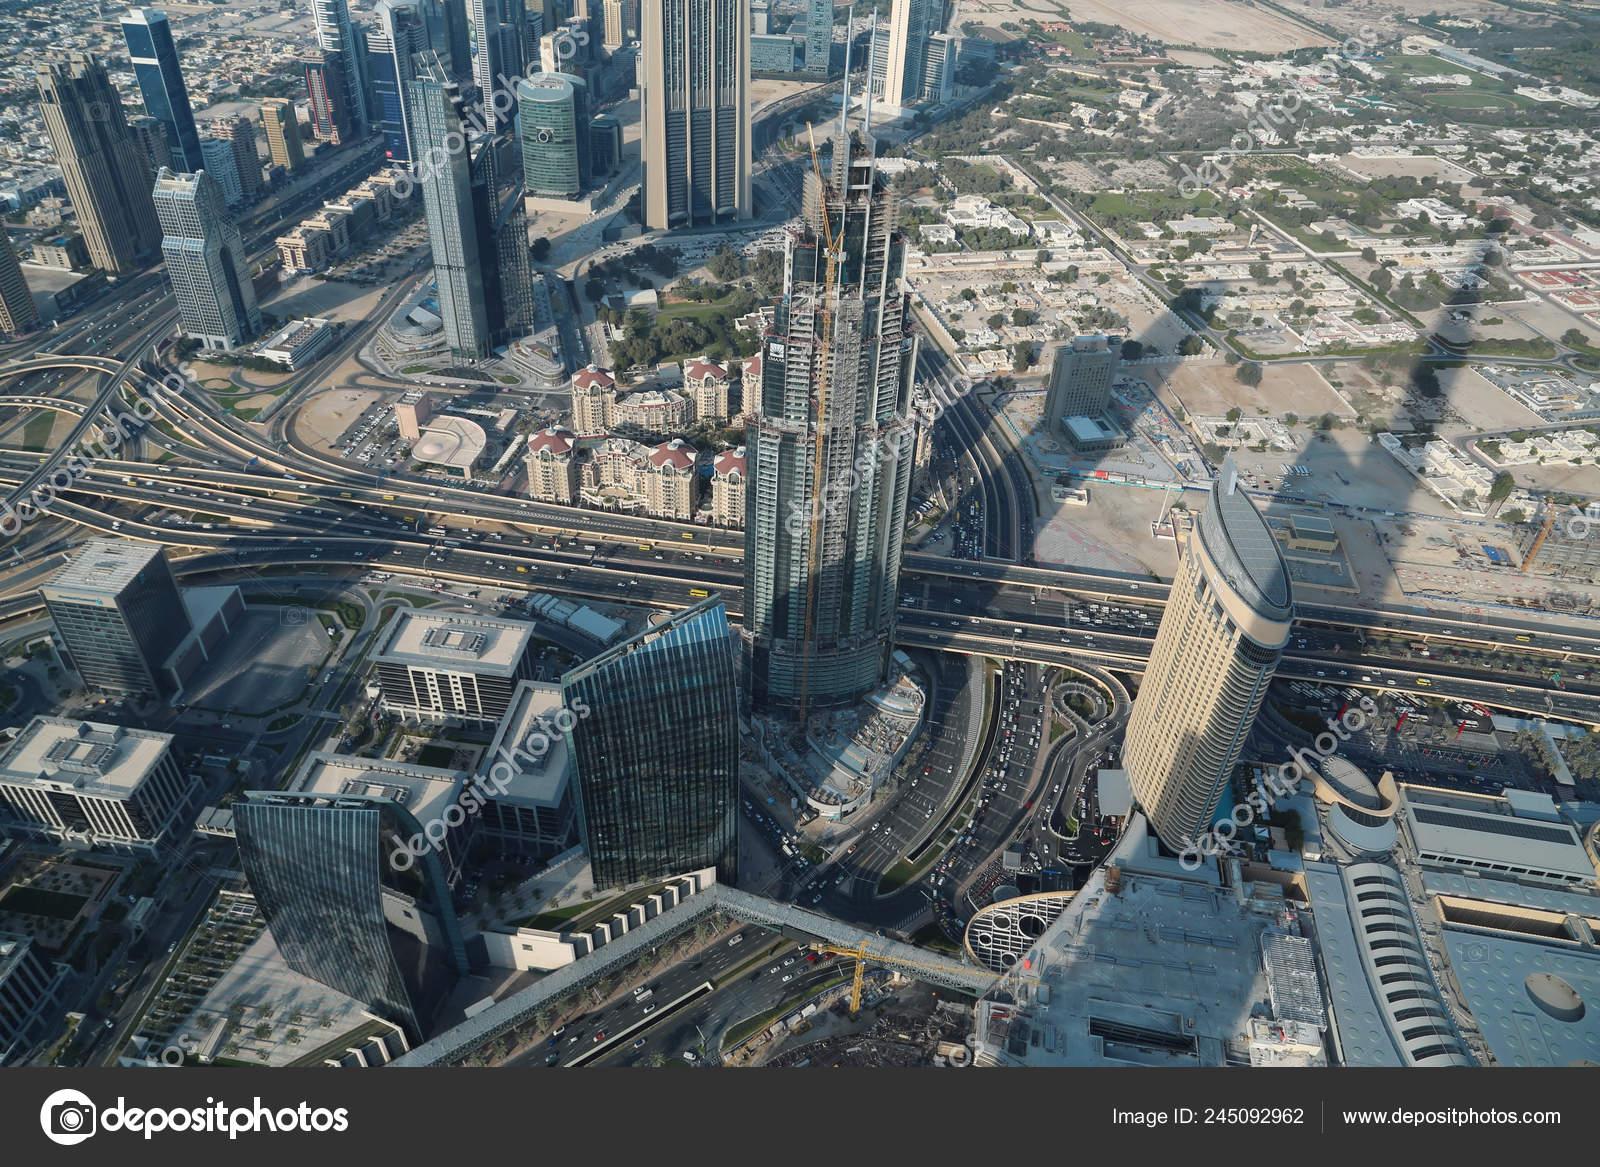 Dubai Downtown 125Th Floor Burj